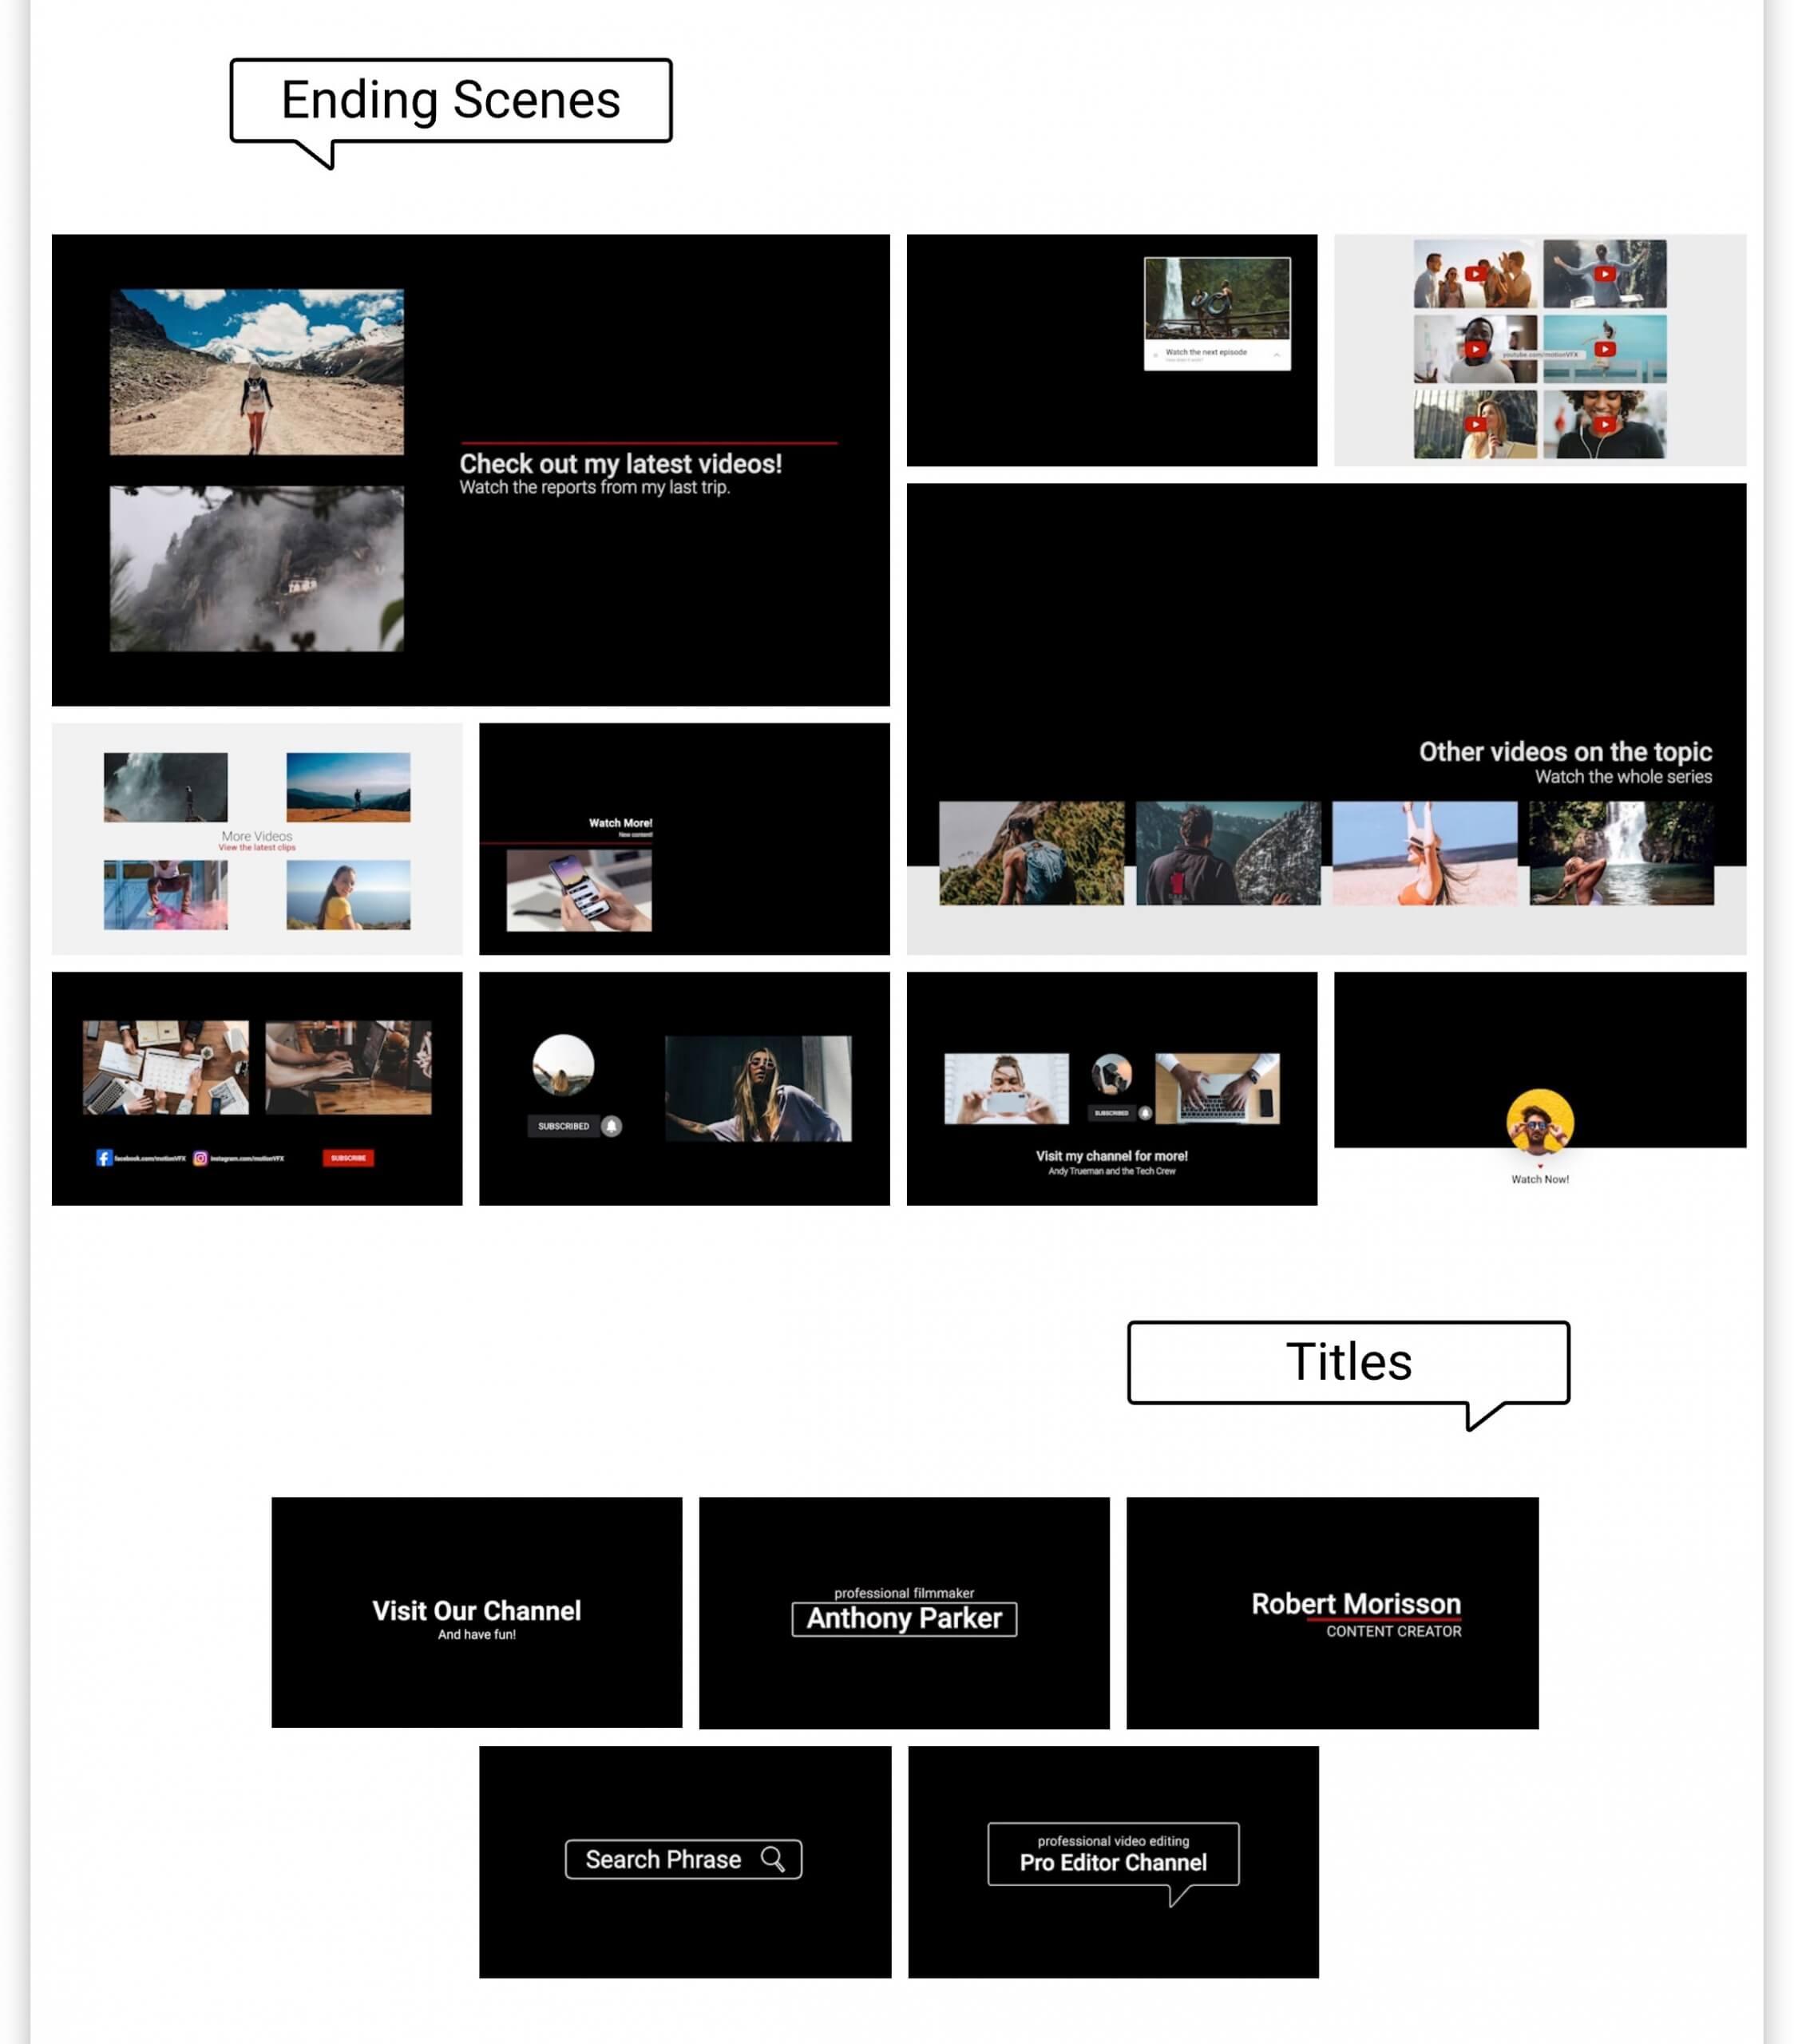 fcpx插件 视频博主影片制作工具包 LOGO展示下节预告点赞背景等 mTuber 2